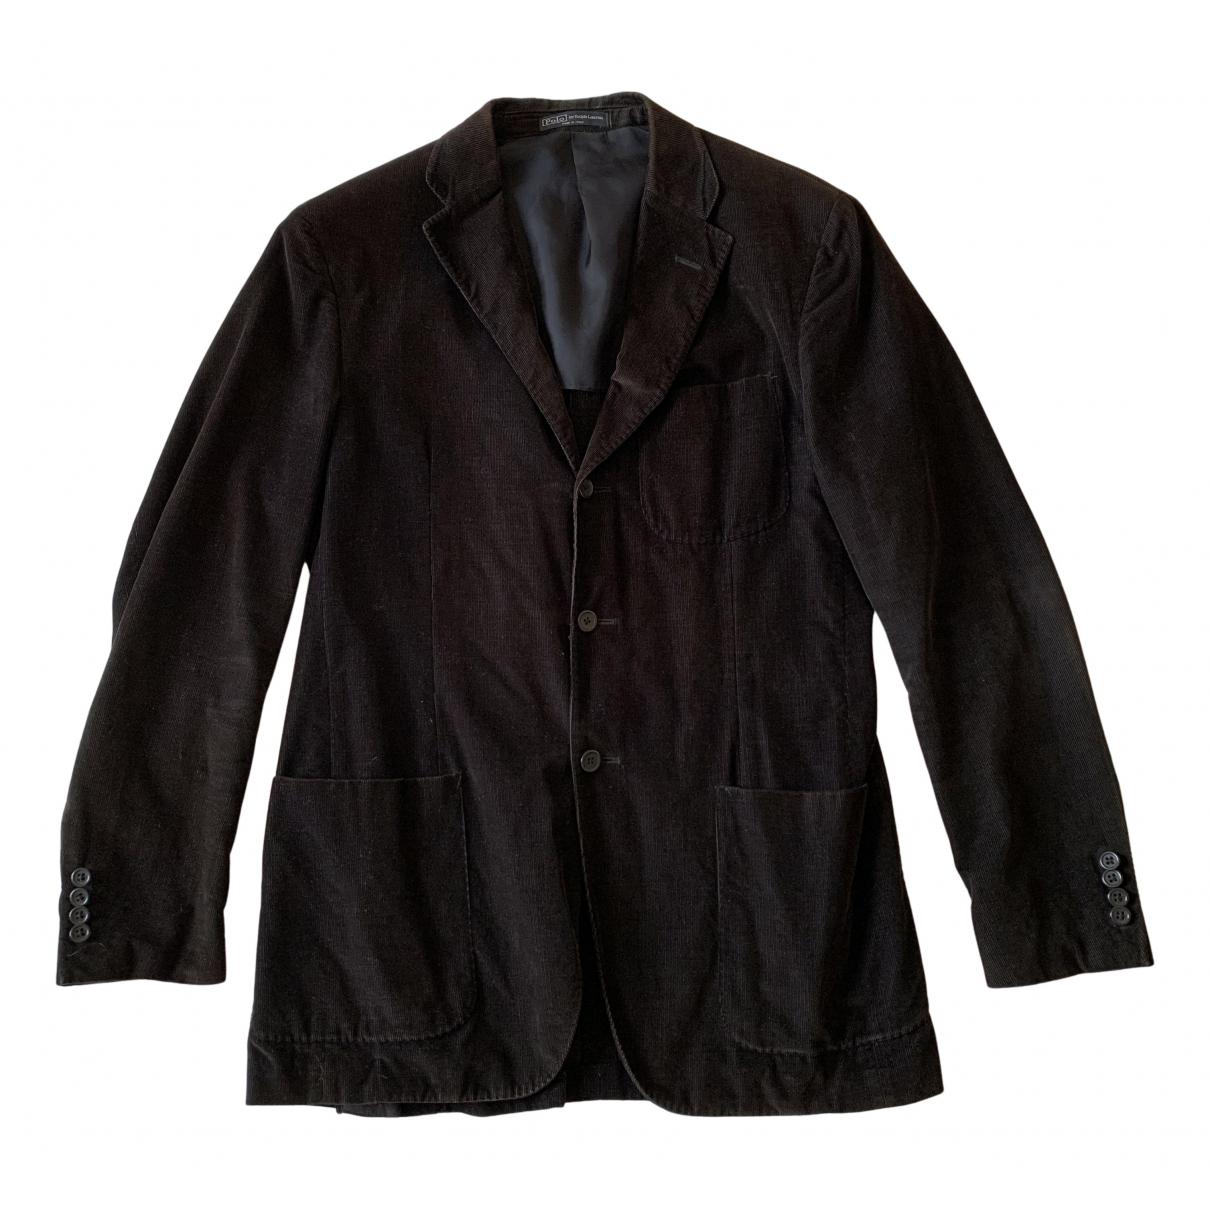 Polo Ralph Lauren N Brown Cotton jacket  for Men L International